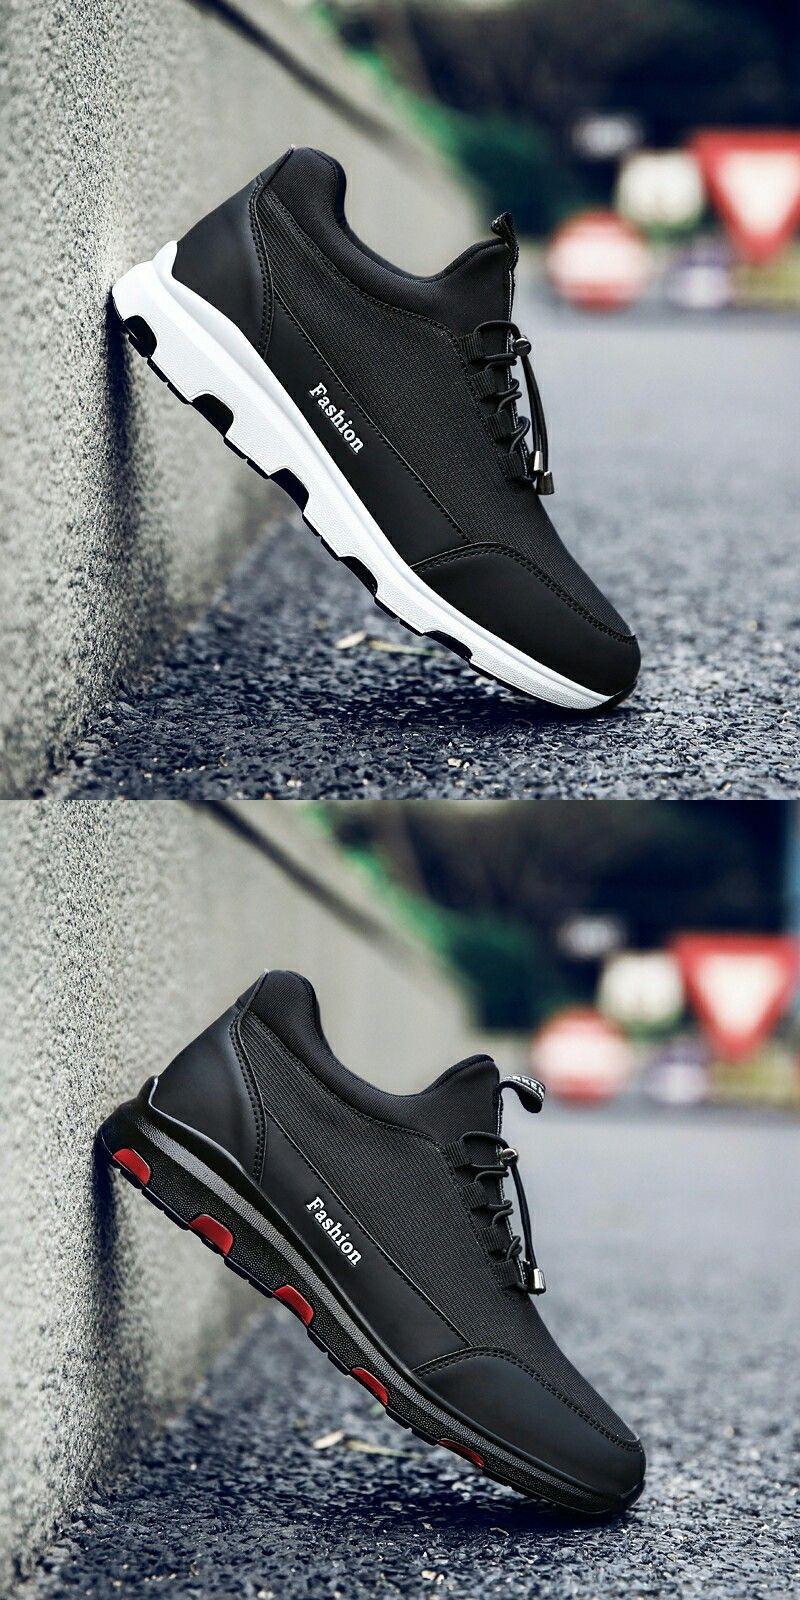 US $24.28 <Click to buy> Prikol Brand Men Sports Shoes